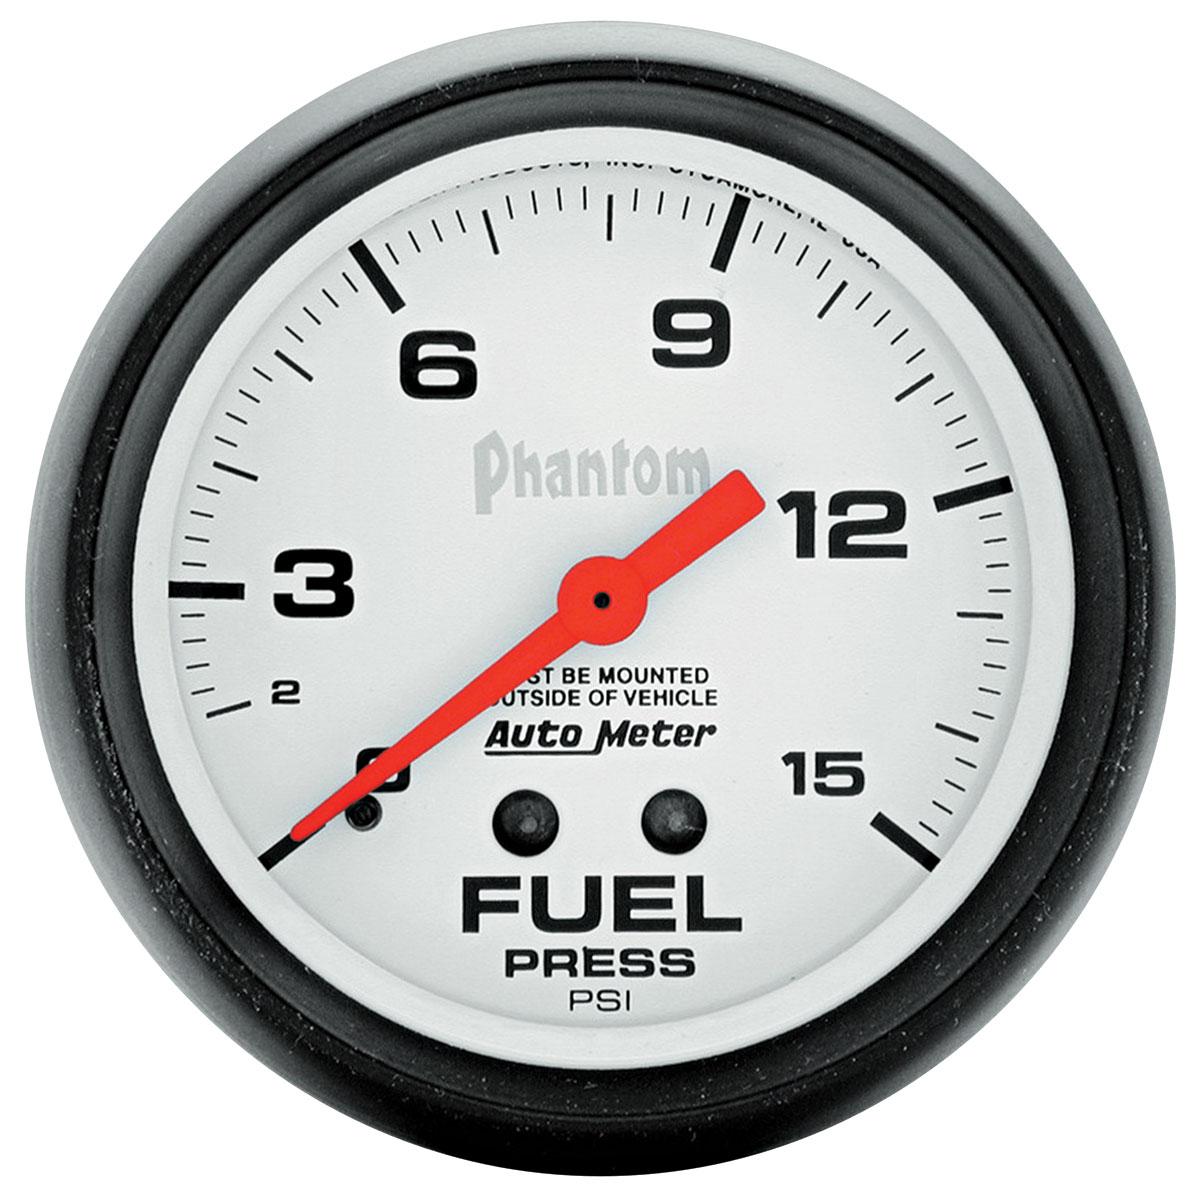 Gauge, Fuel Pressure, Auto Meter, Phantom, 2-5/8